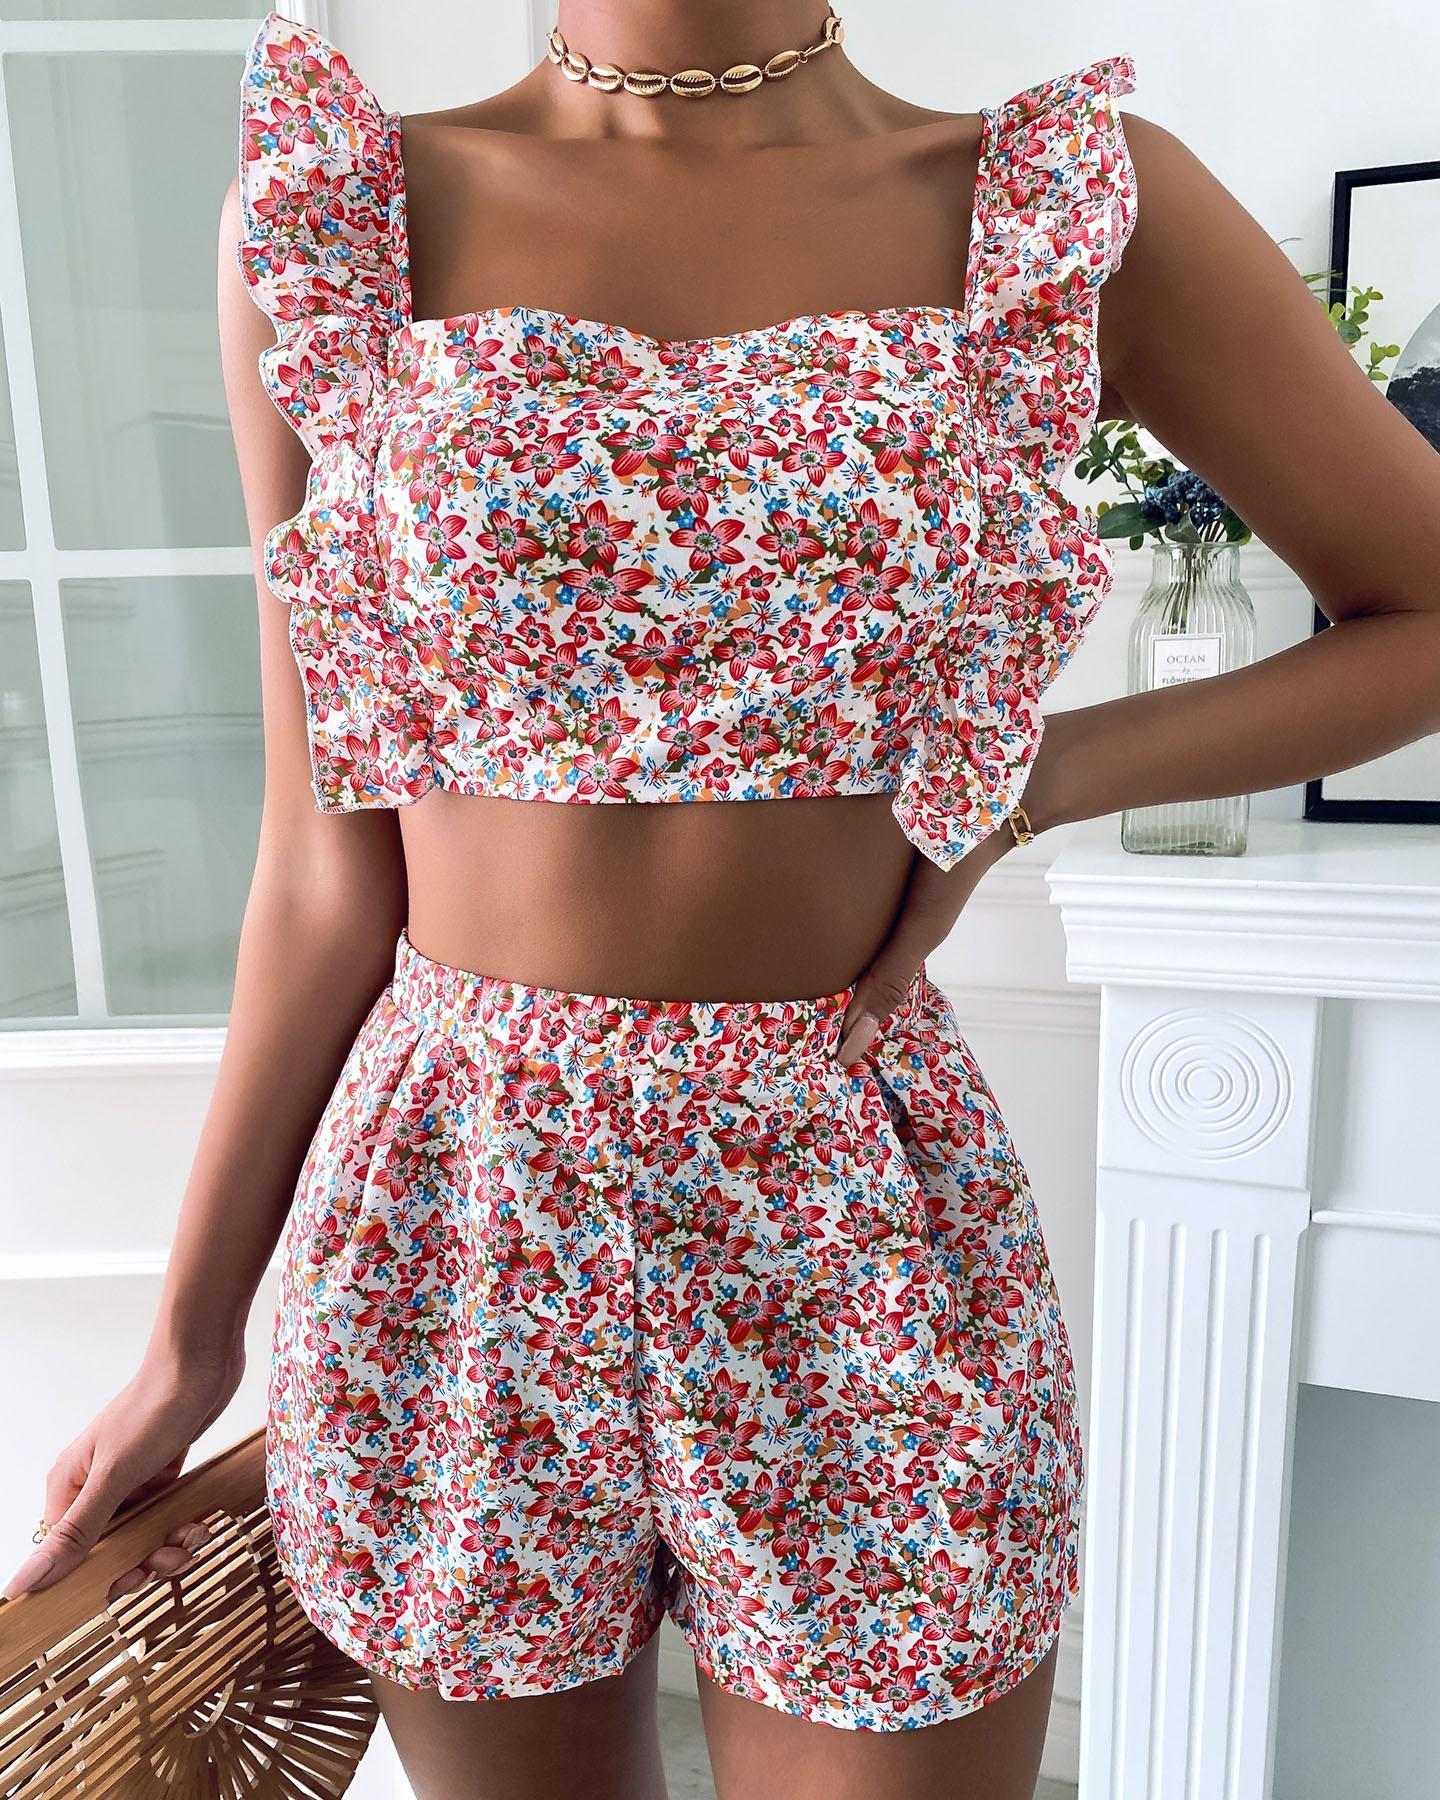 Ruffles Trim Floral Print Backless Crop Top & Shorts Set